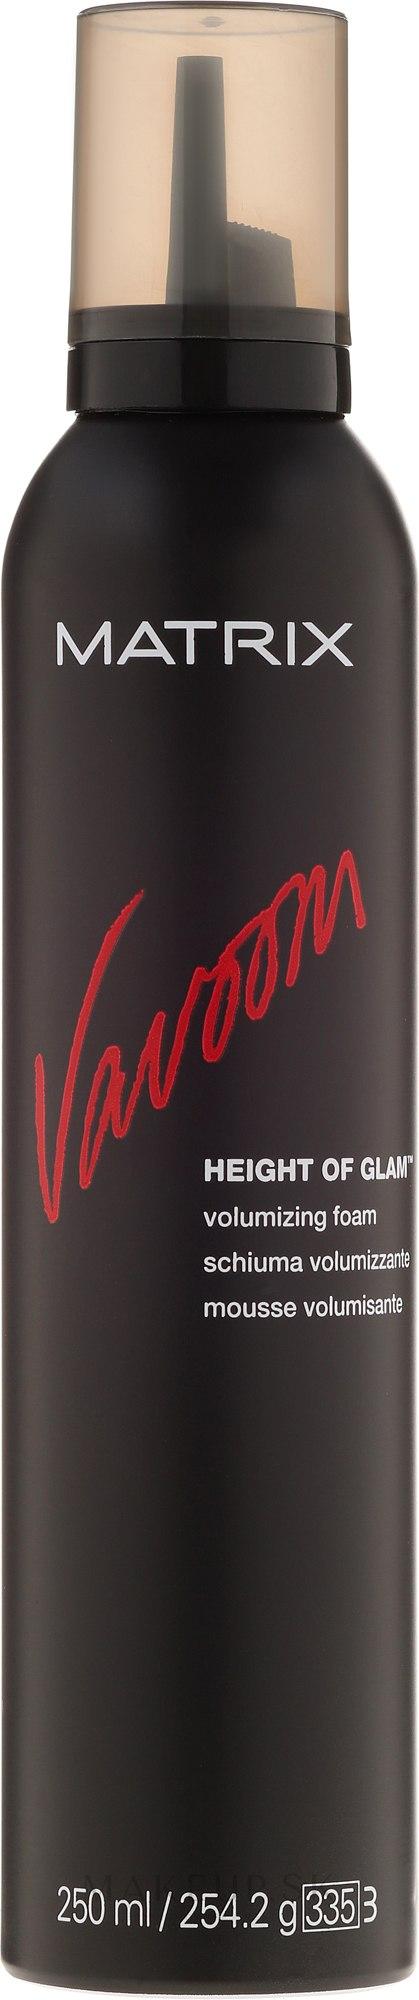 Mušt na vlasy pre ich objem - Matrix Vavoom Height Of Glam Volumizing Foam  — Obrázky 250 ml